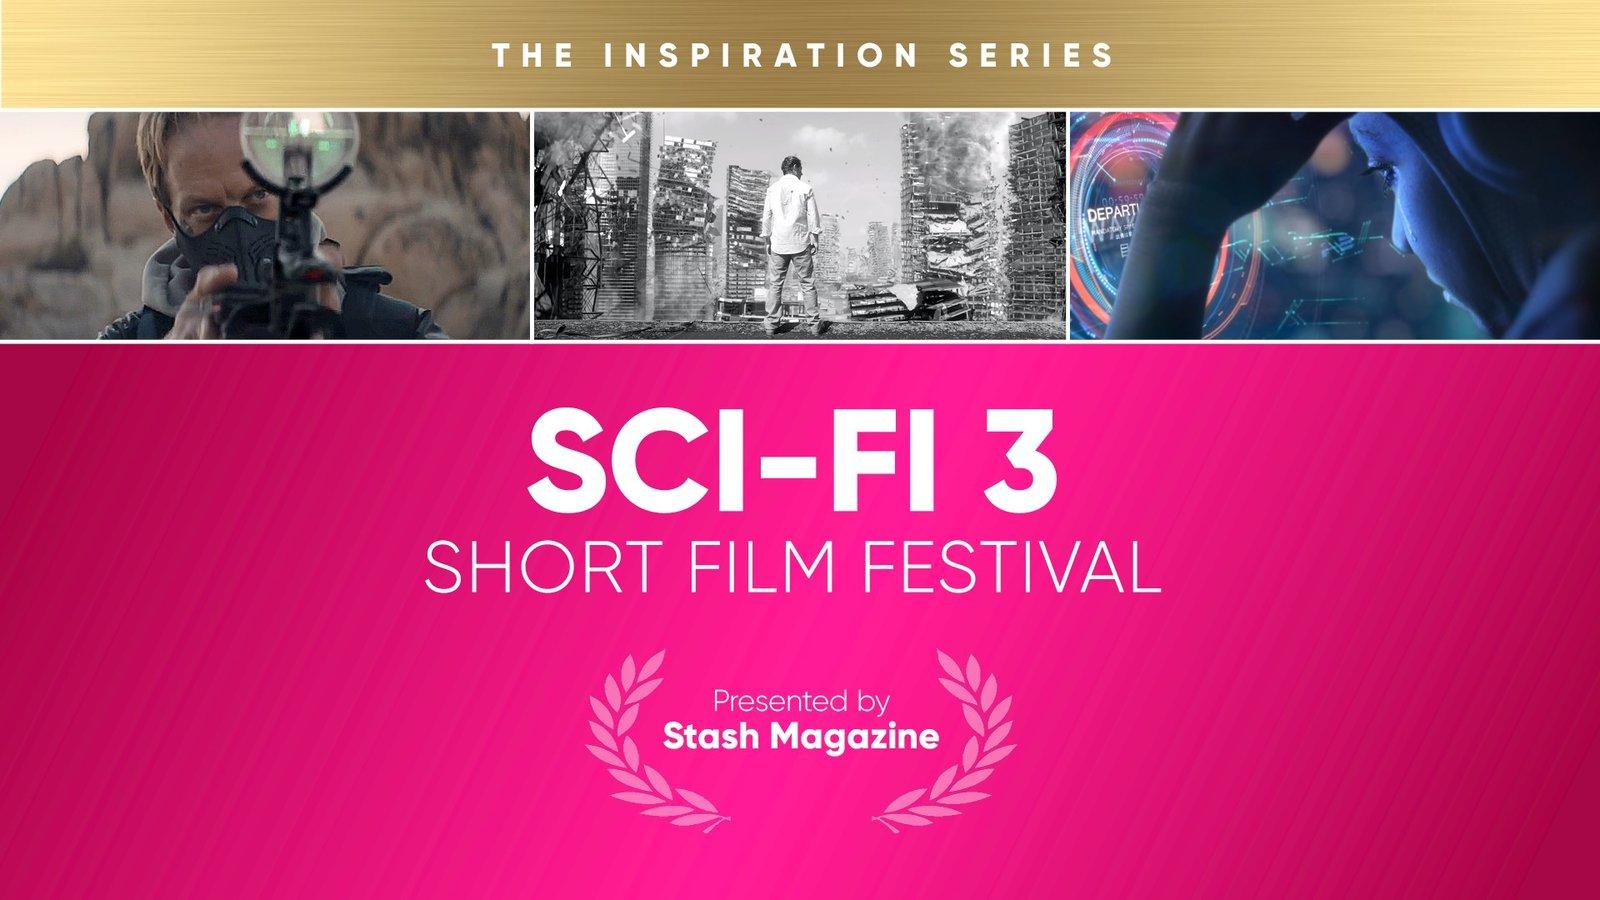 Stash Short Film Festival: Sci-Fi 3